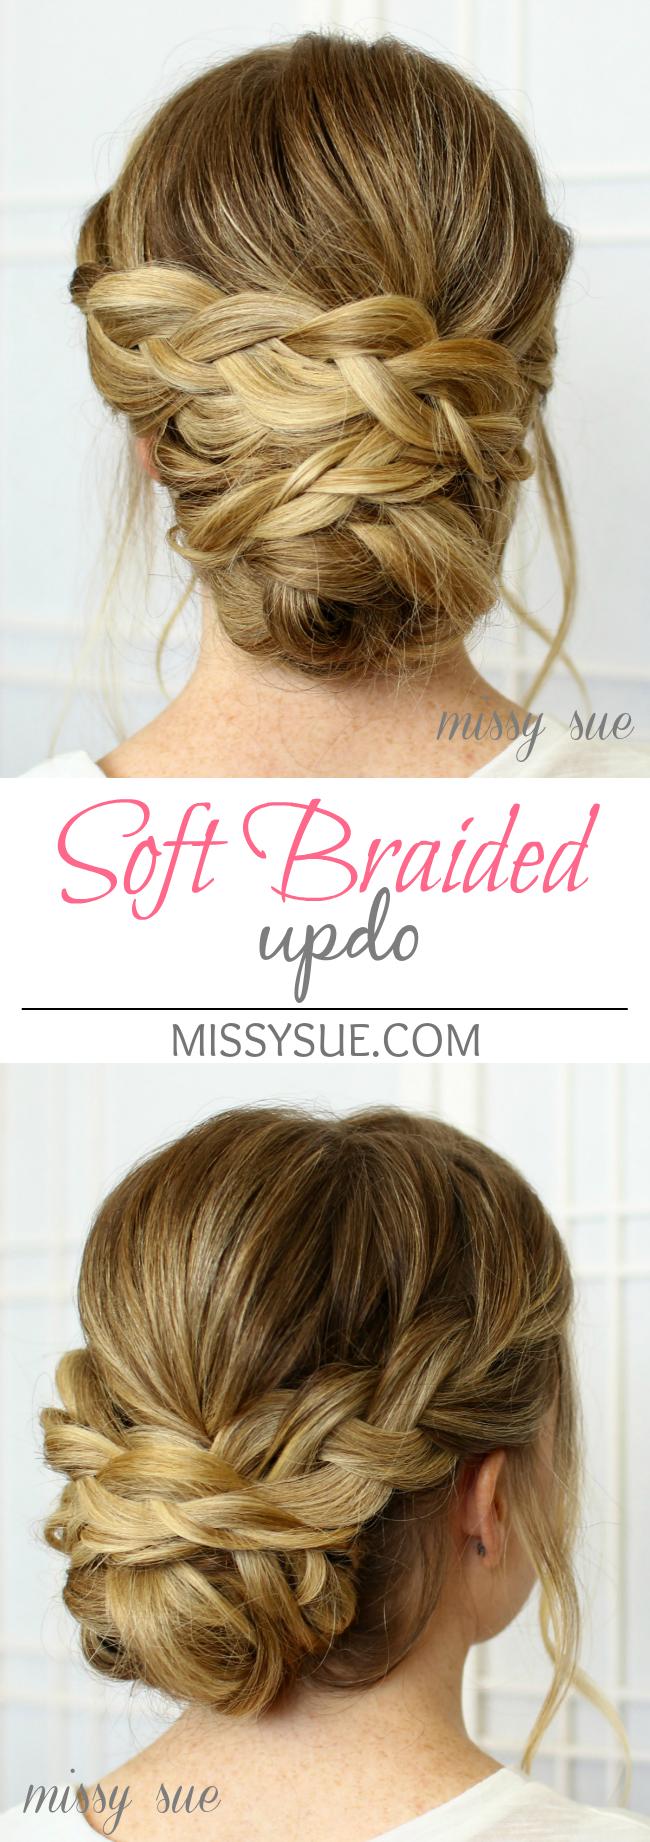 soft-braided-updo-bridal-hairstyle | wedding hair | pinterest